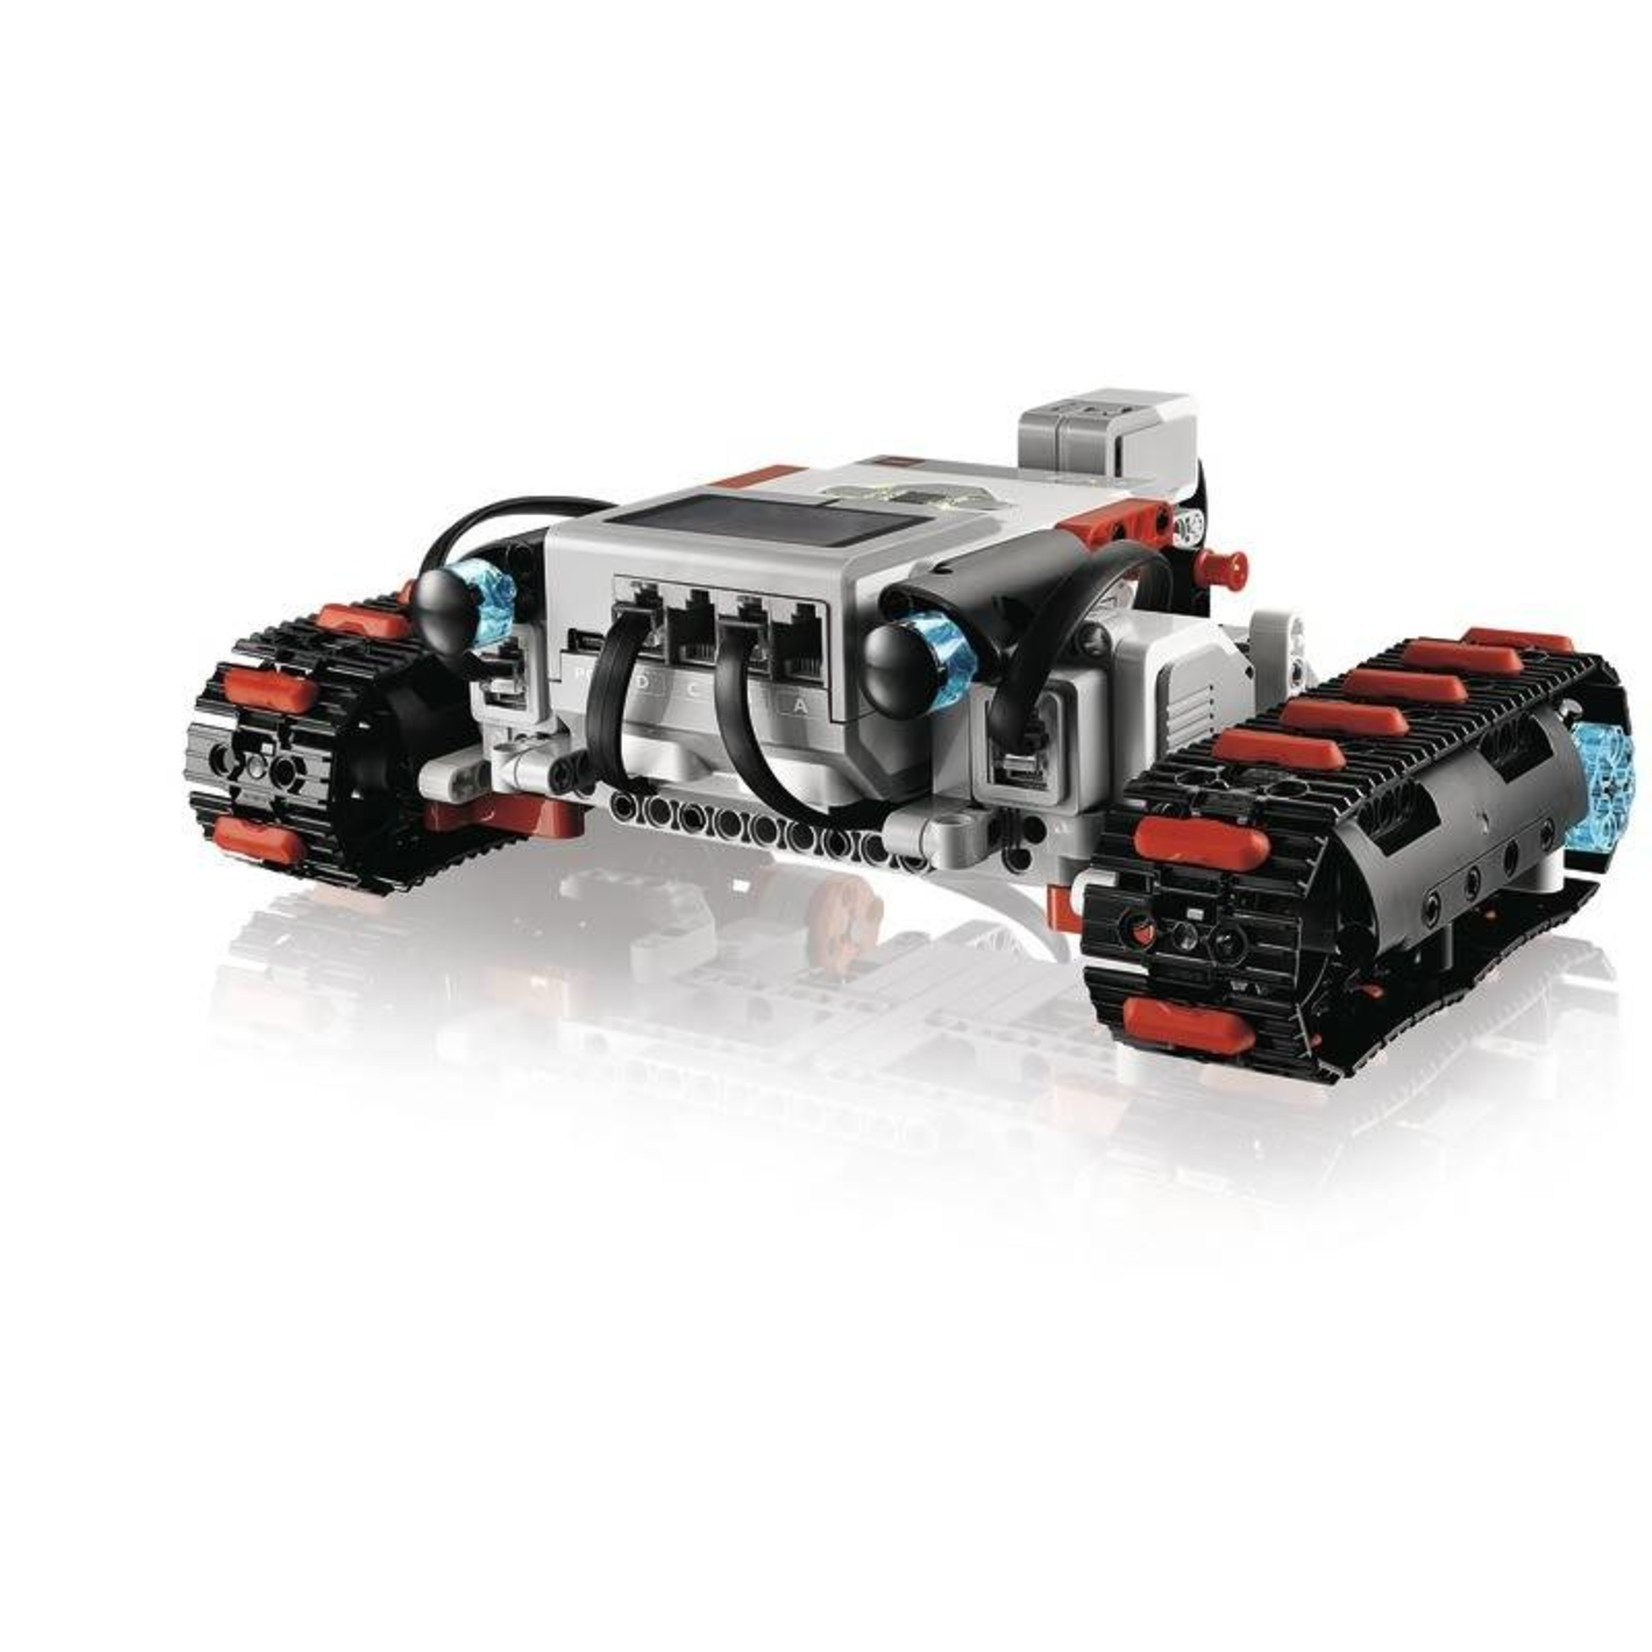 LEGO® Education EV3 Education Resource Set